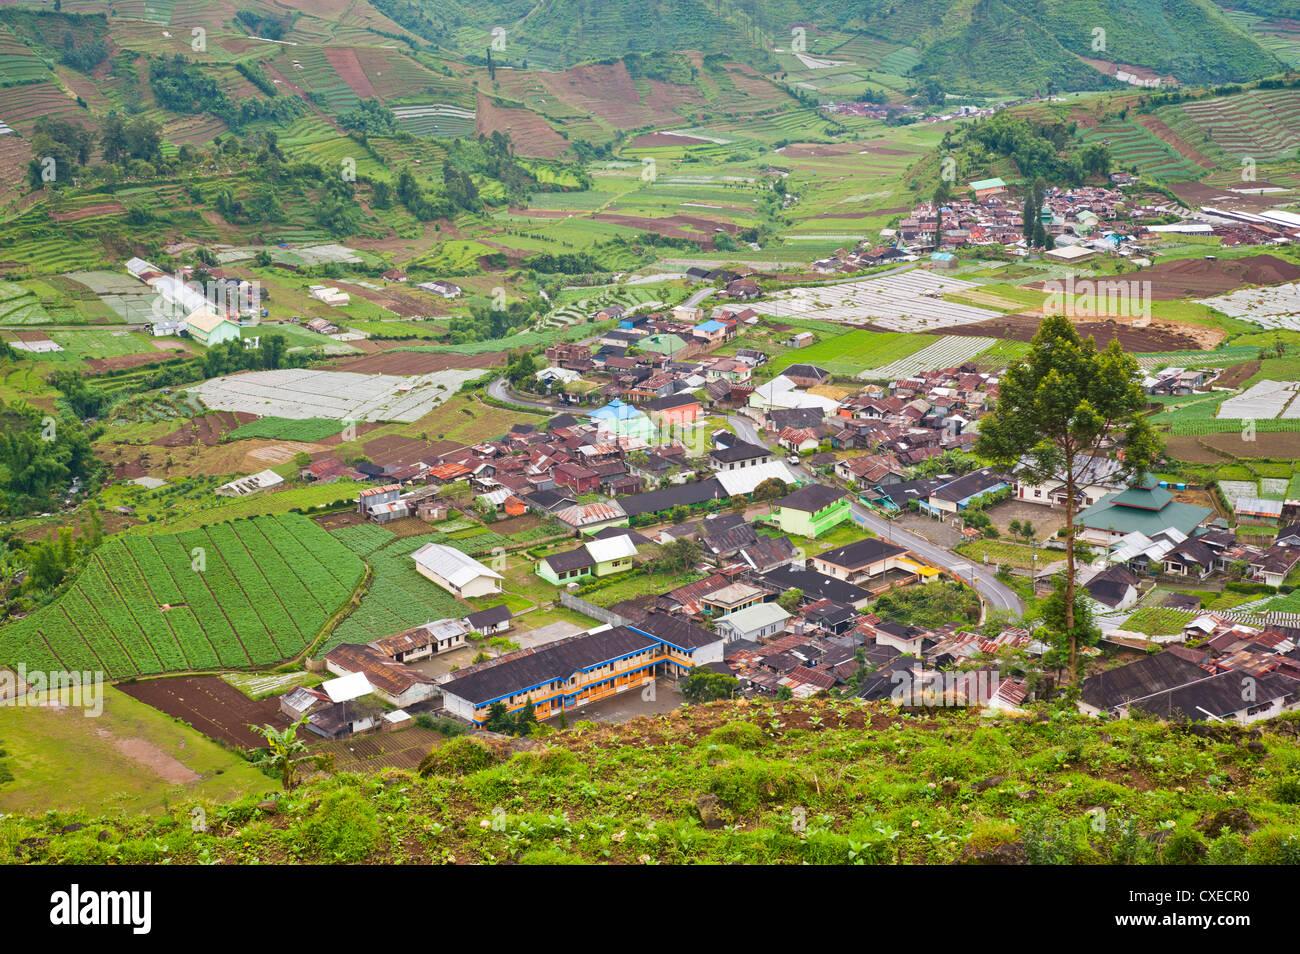 Wonosobo Stadt, Dieng Plateau, Java, Indonesien, Südostasien, Asien Stockbild